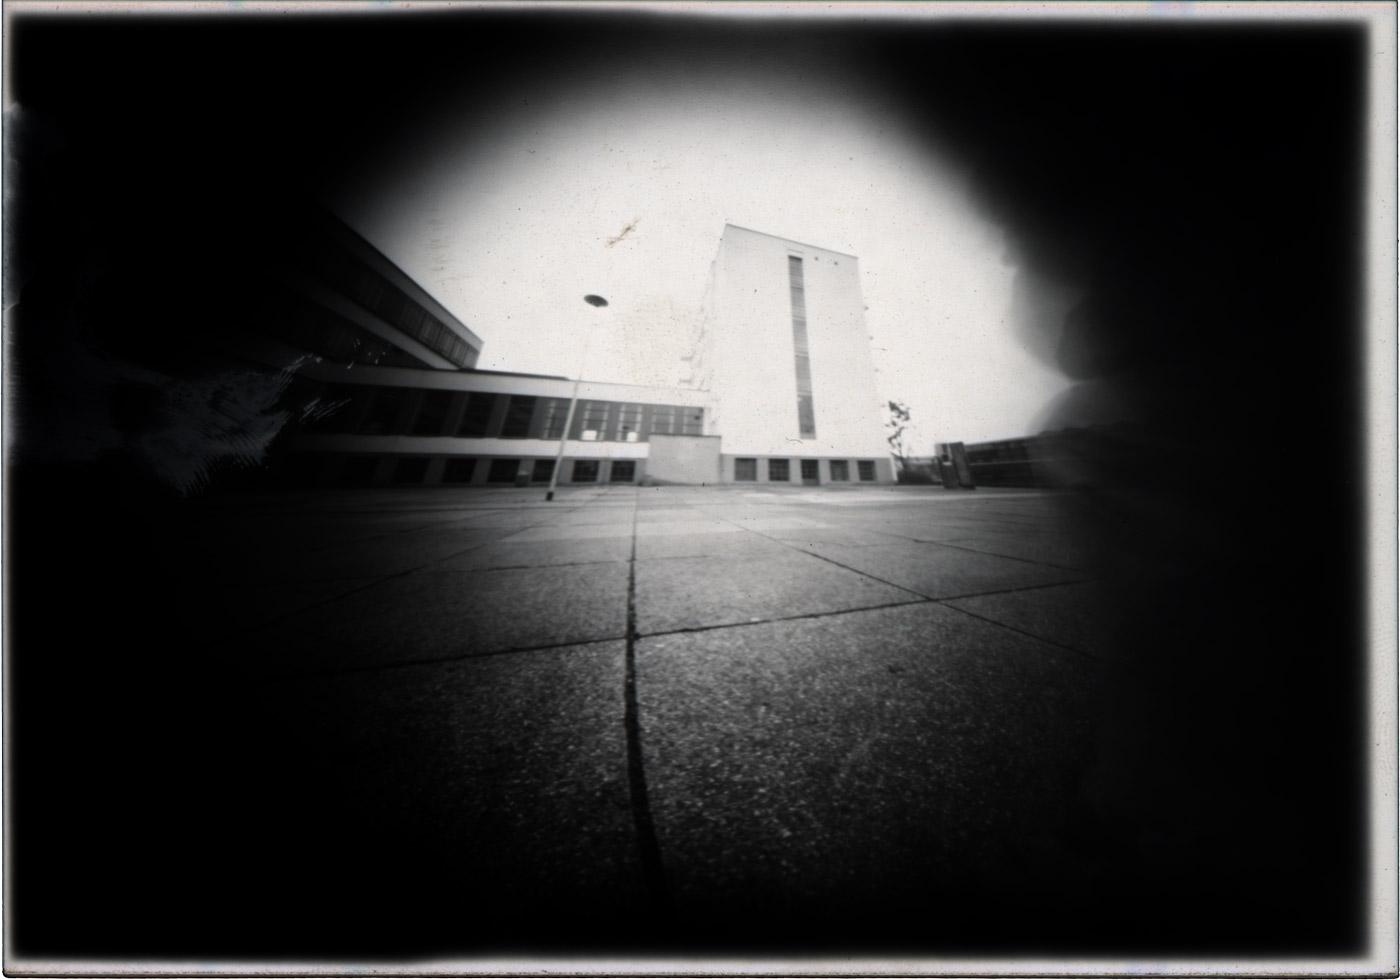 Das Bauhaus in Dessau experimentelle fotografiert